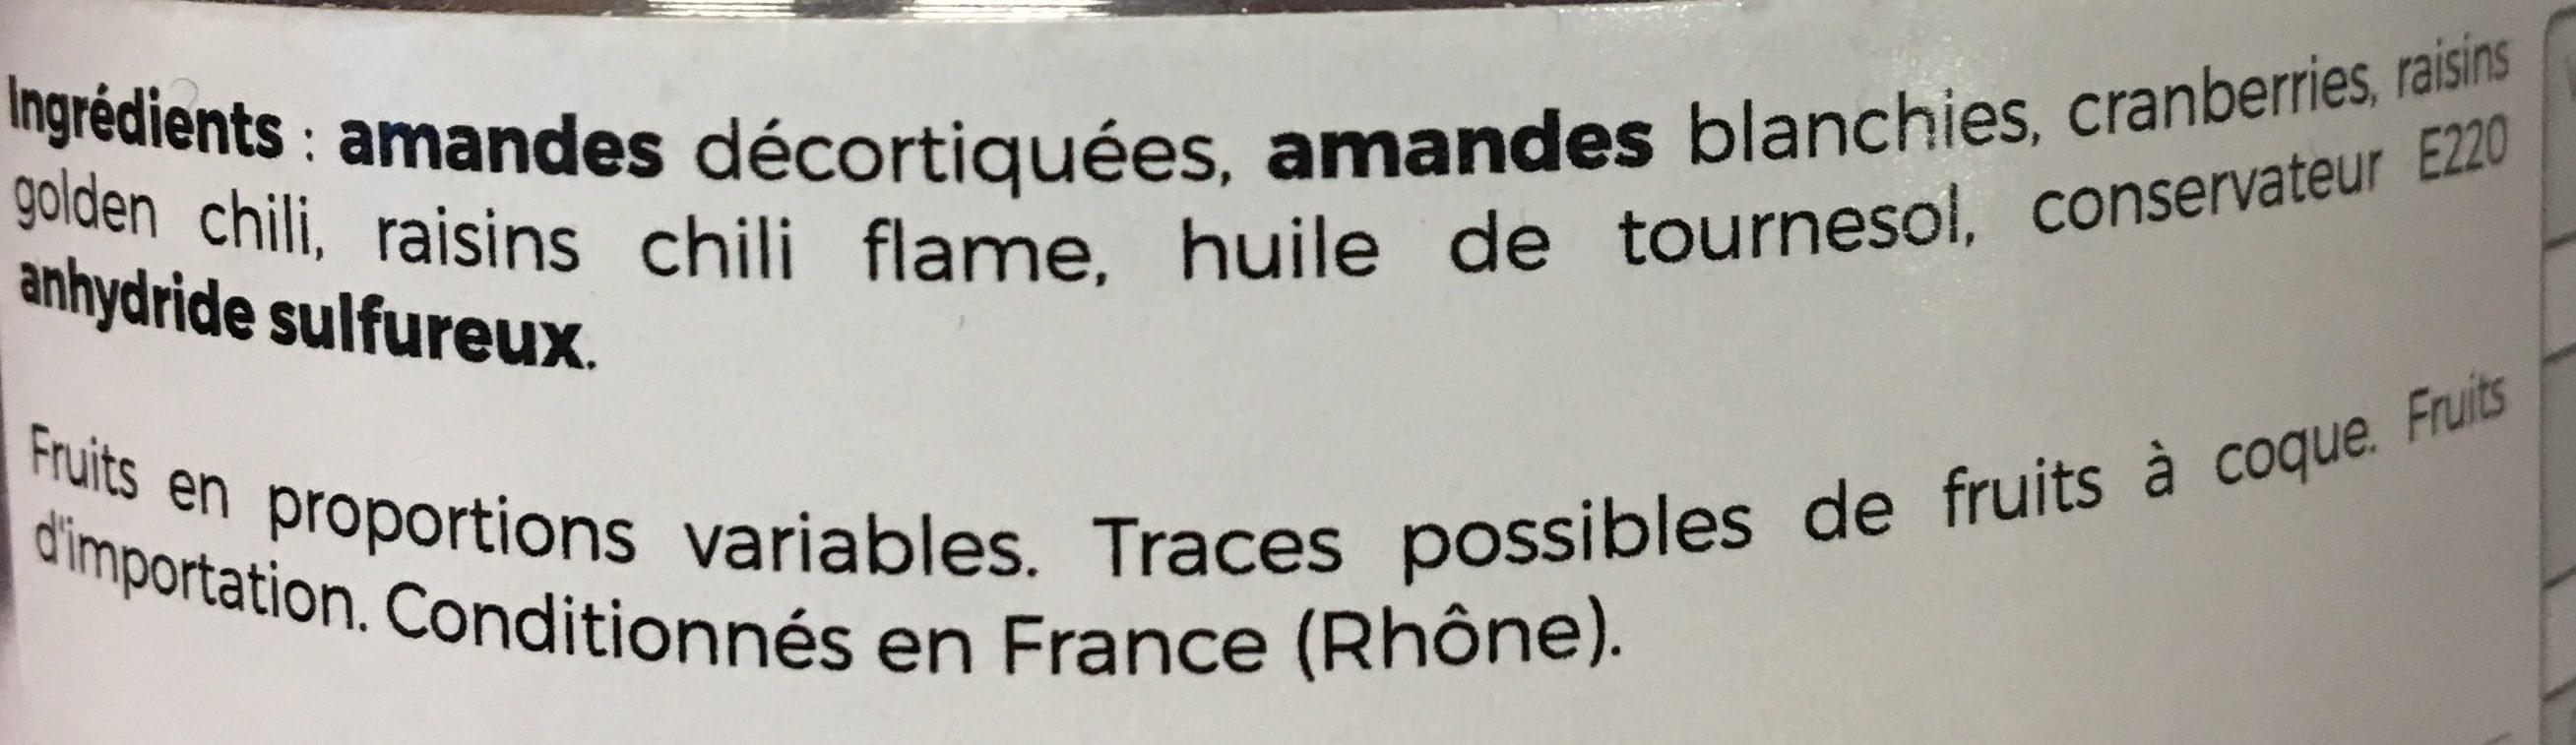 Mélange sportif - Ingrédients - fr